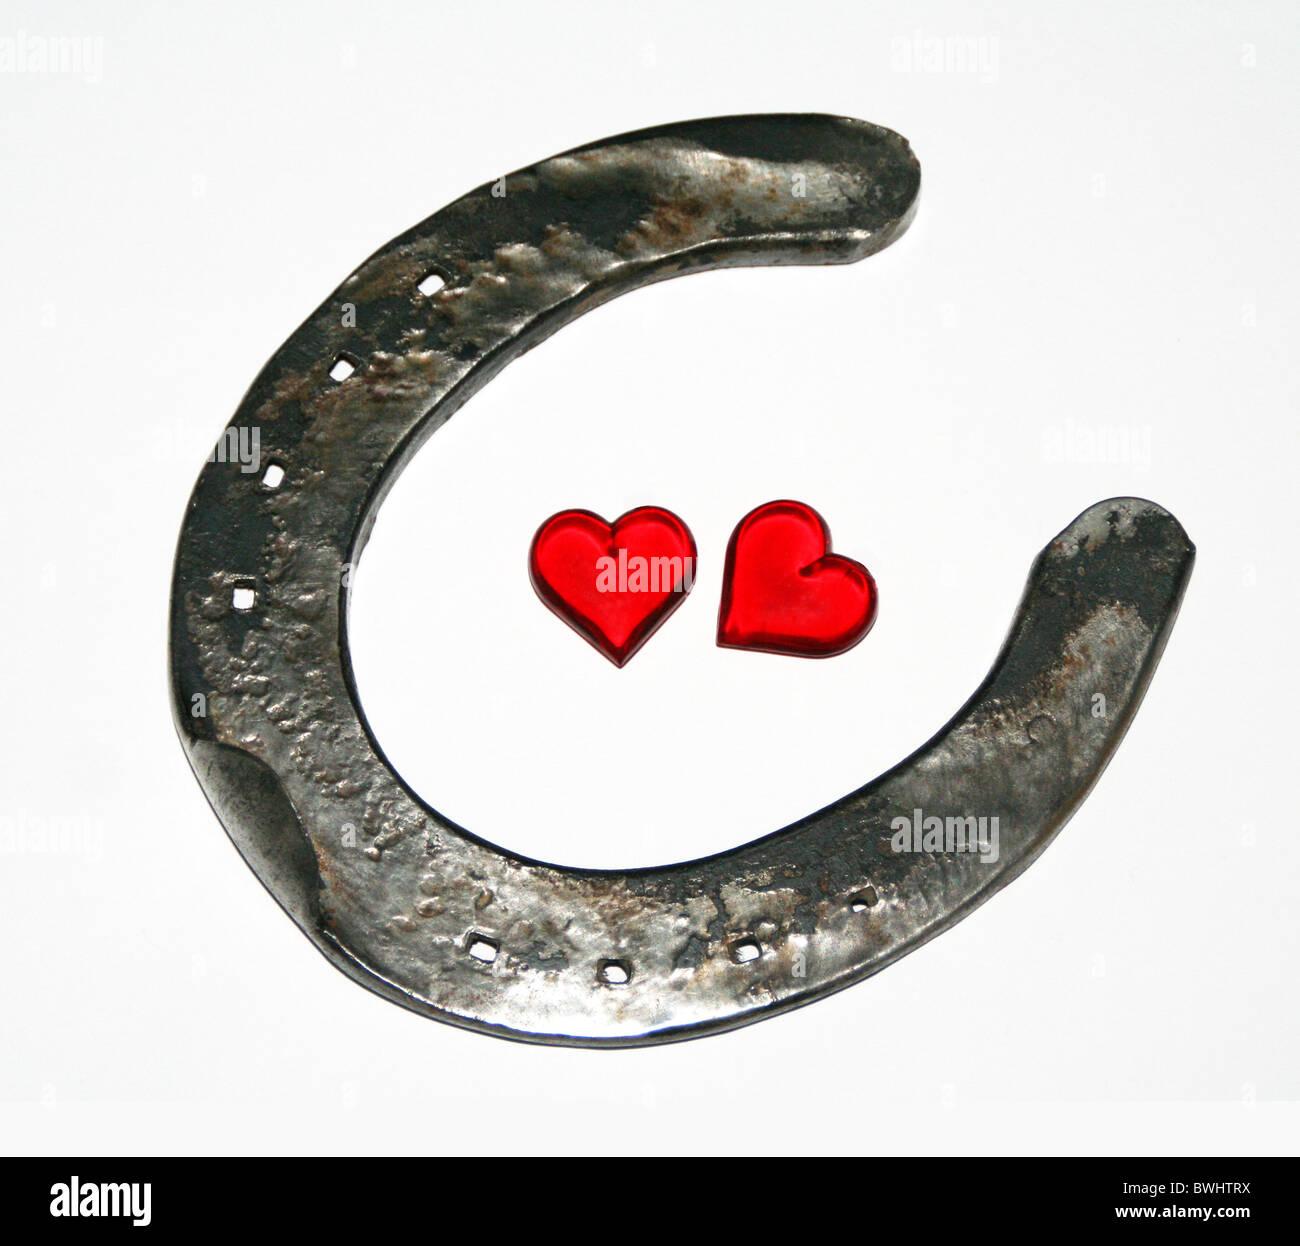 cuddle succeed loves symbol symbolical falling in love emotion heart love loyal trust emotion Valentine l - Stock Image